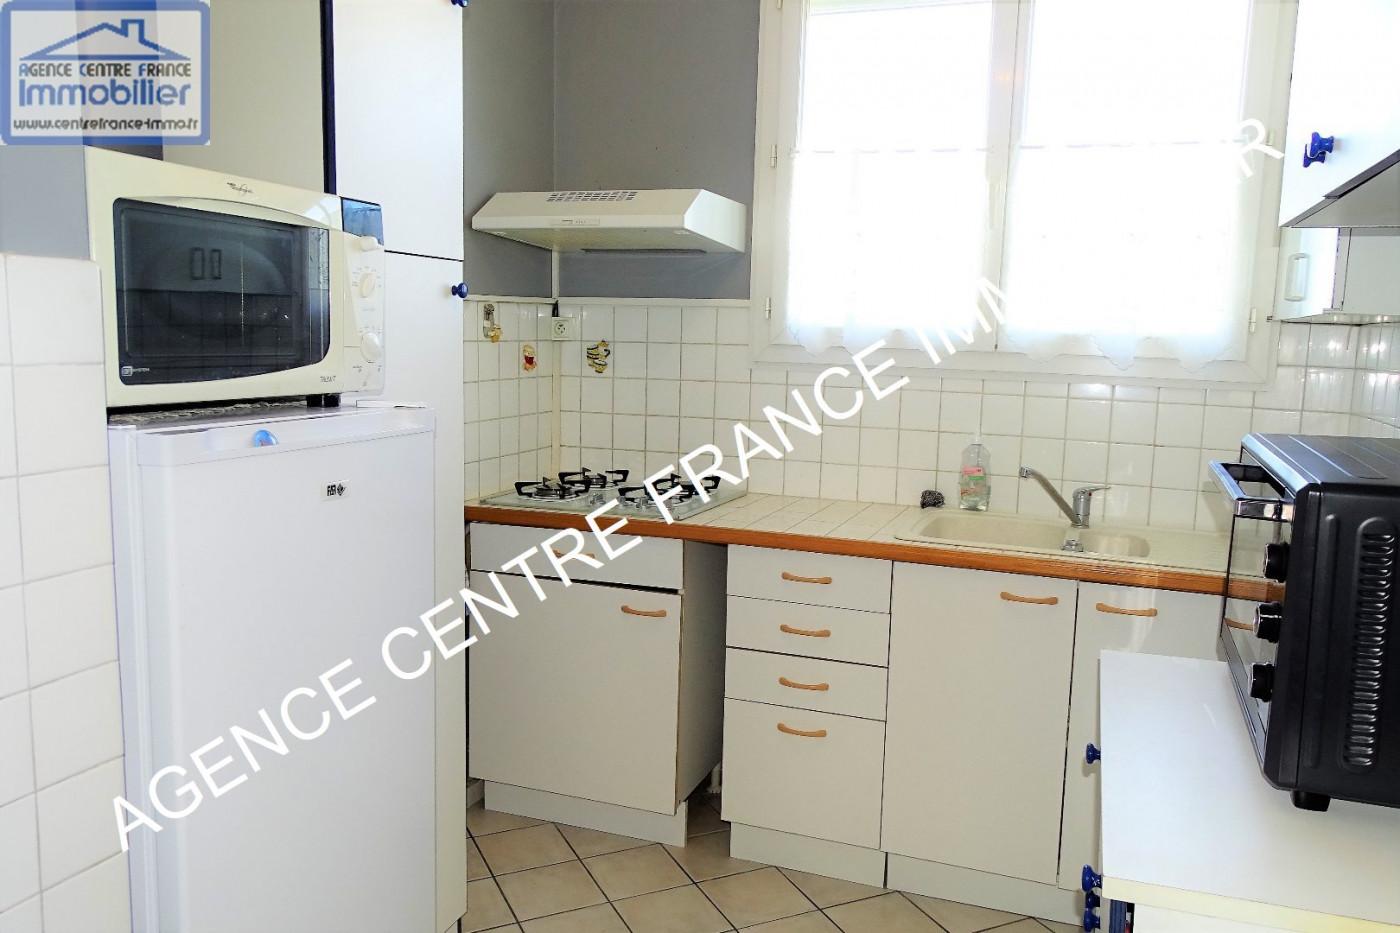 A vendre  Bourges | Réf 030011512 - Agence centre france immobilier